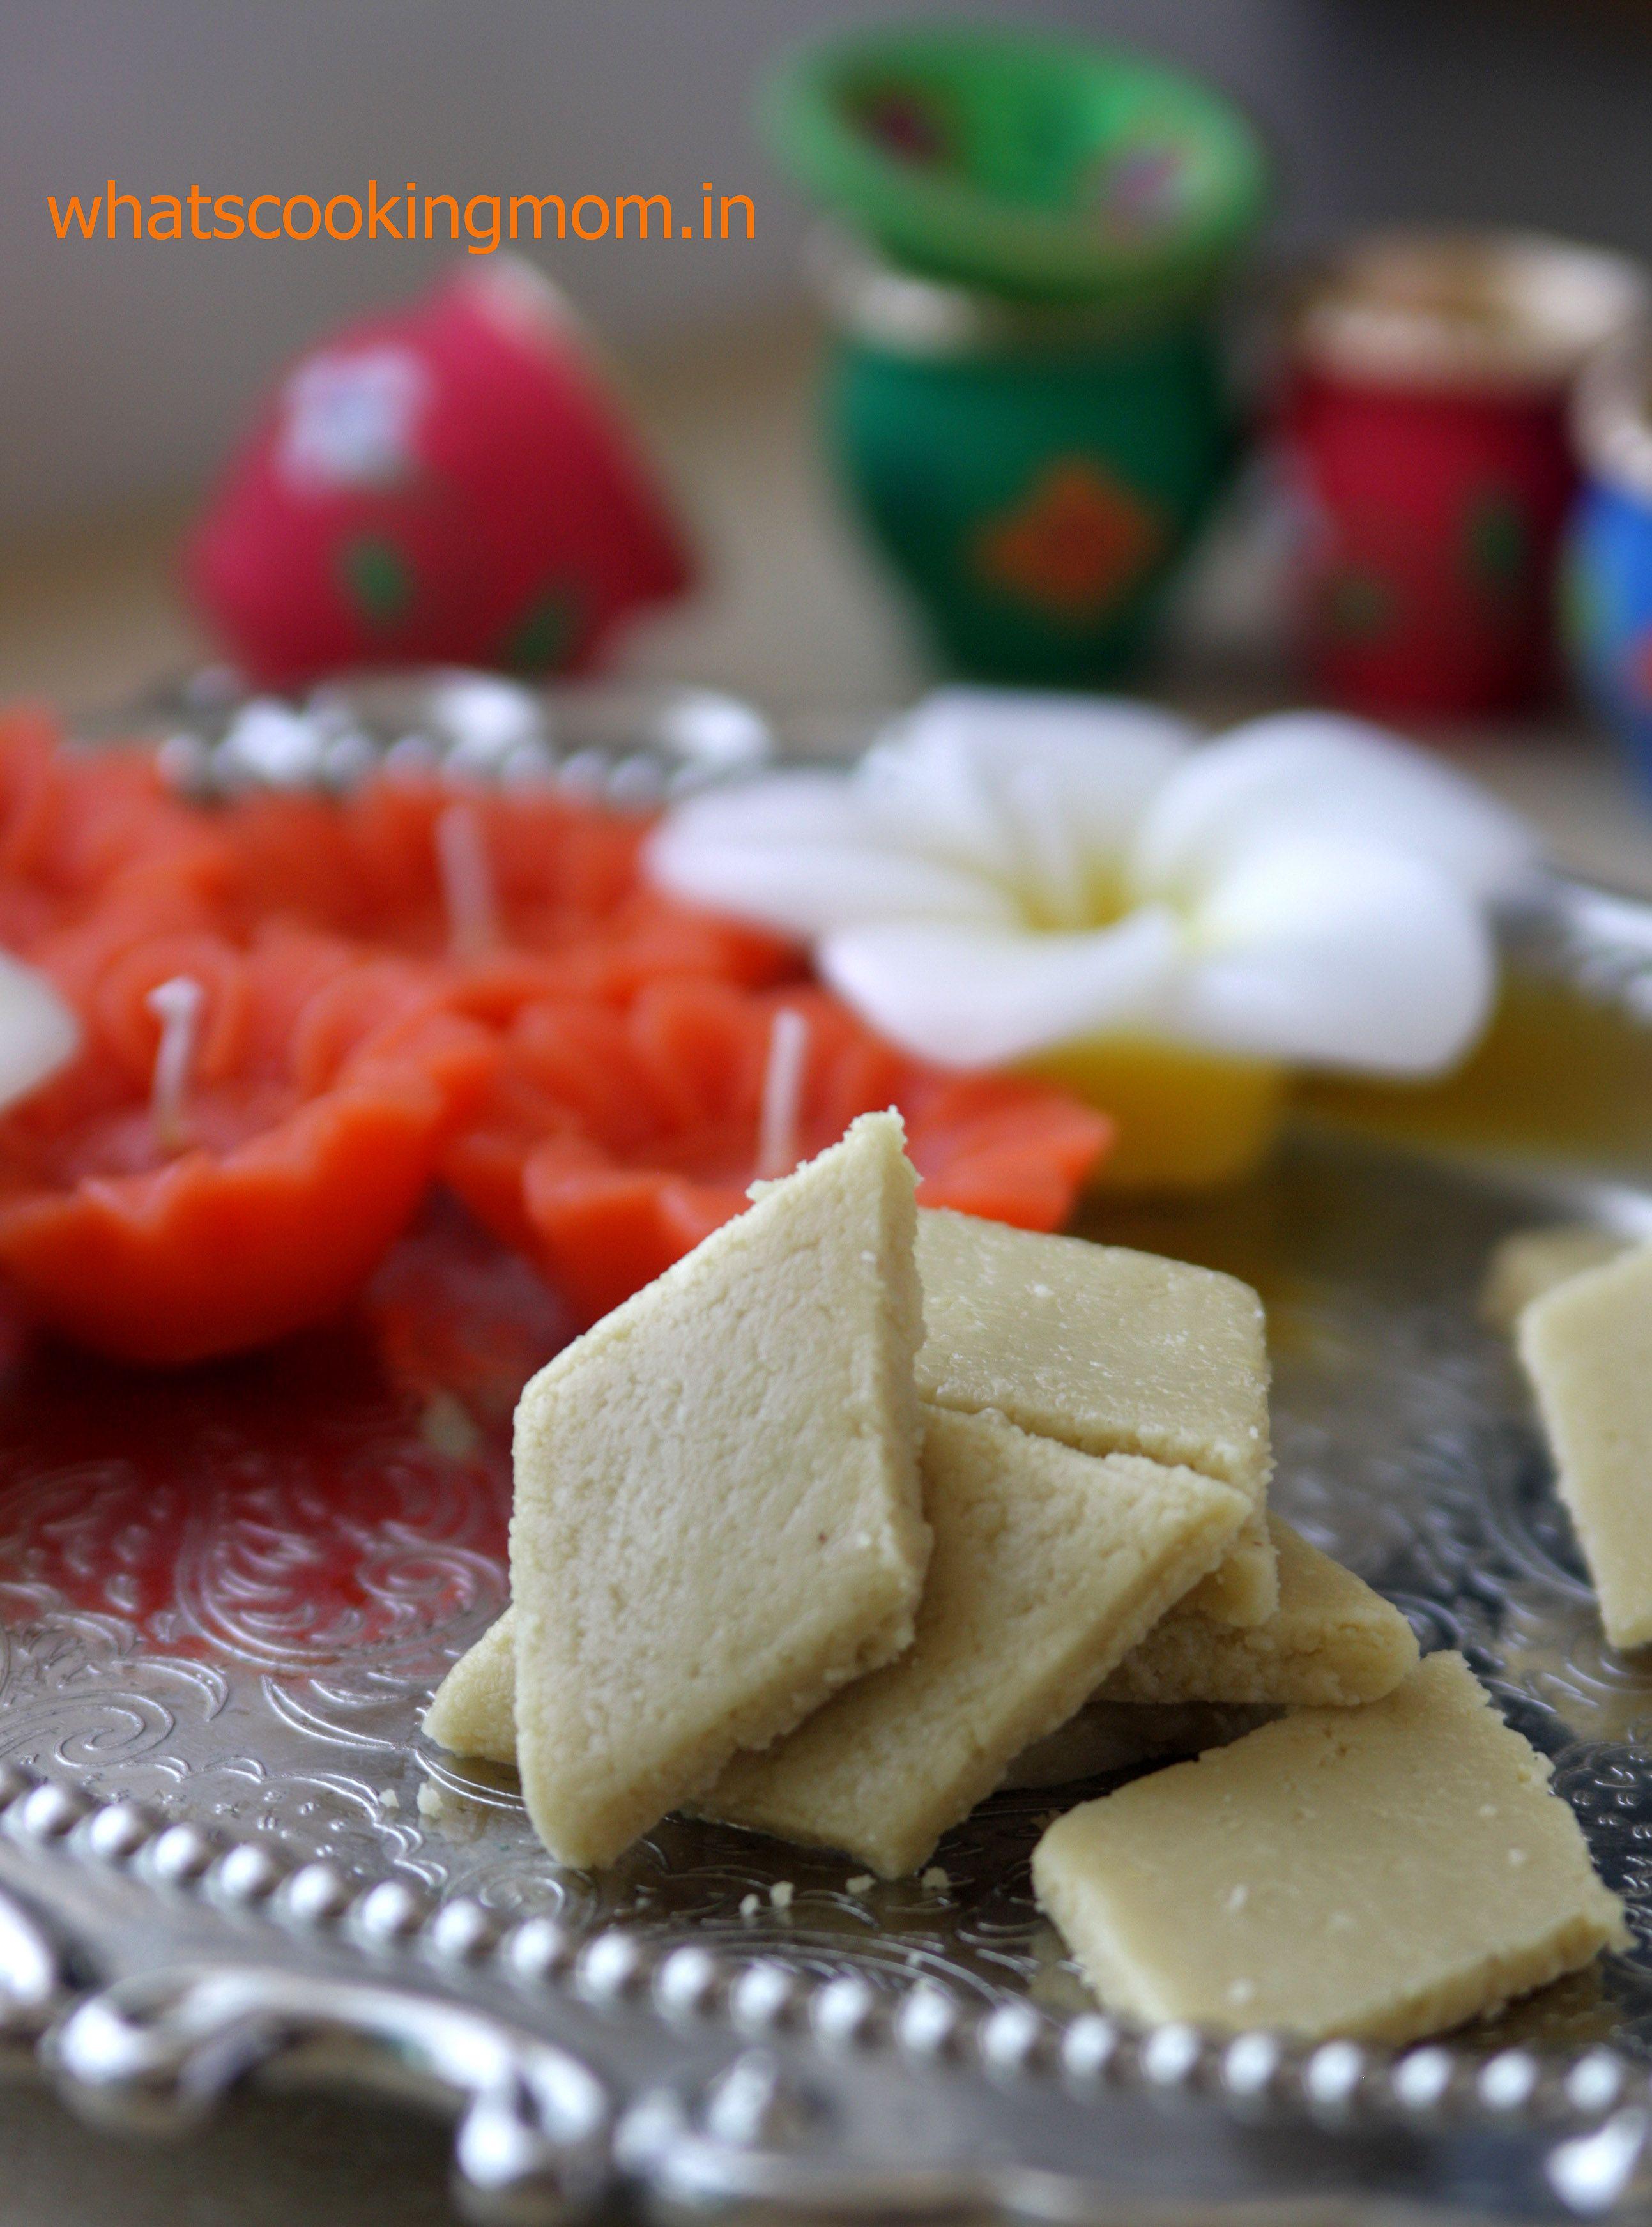 Kaju katli cashewnut fudge indian sweet diwali sweet festival kaju katli cashewnut fudge indian sweet diwali sweet festival sweets and desserts forumfinder Image collections